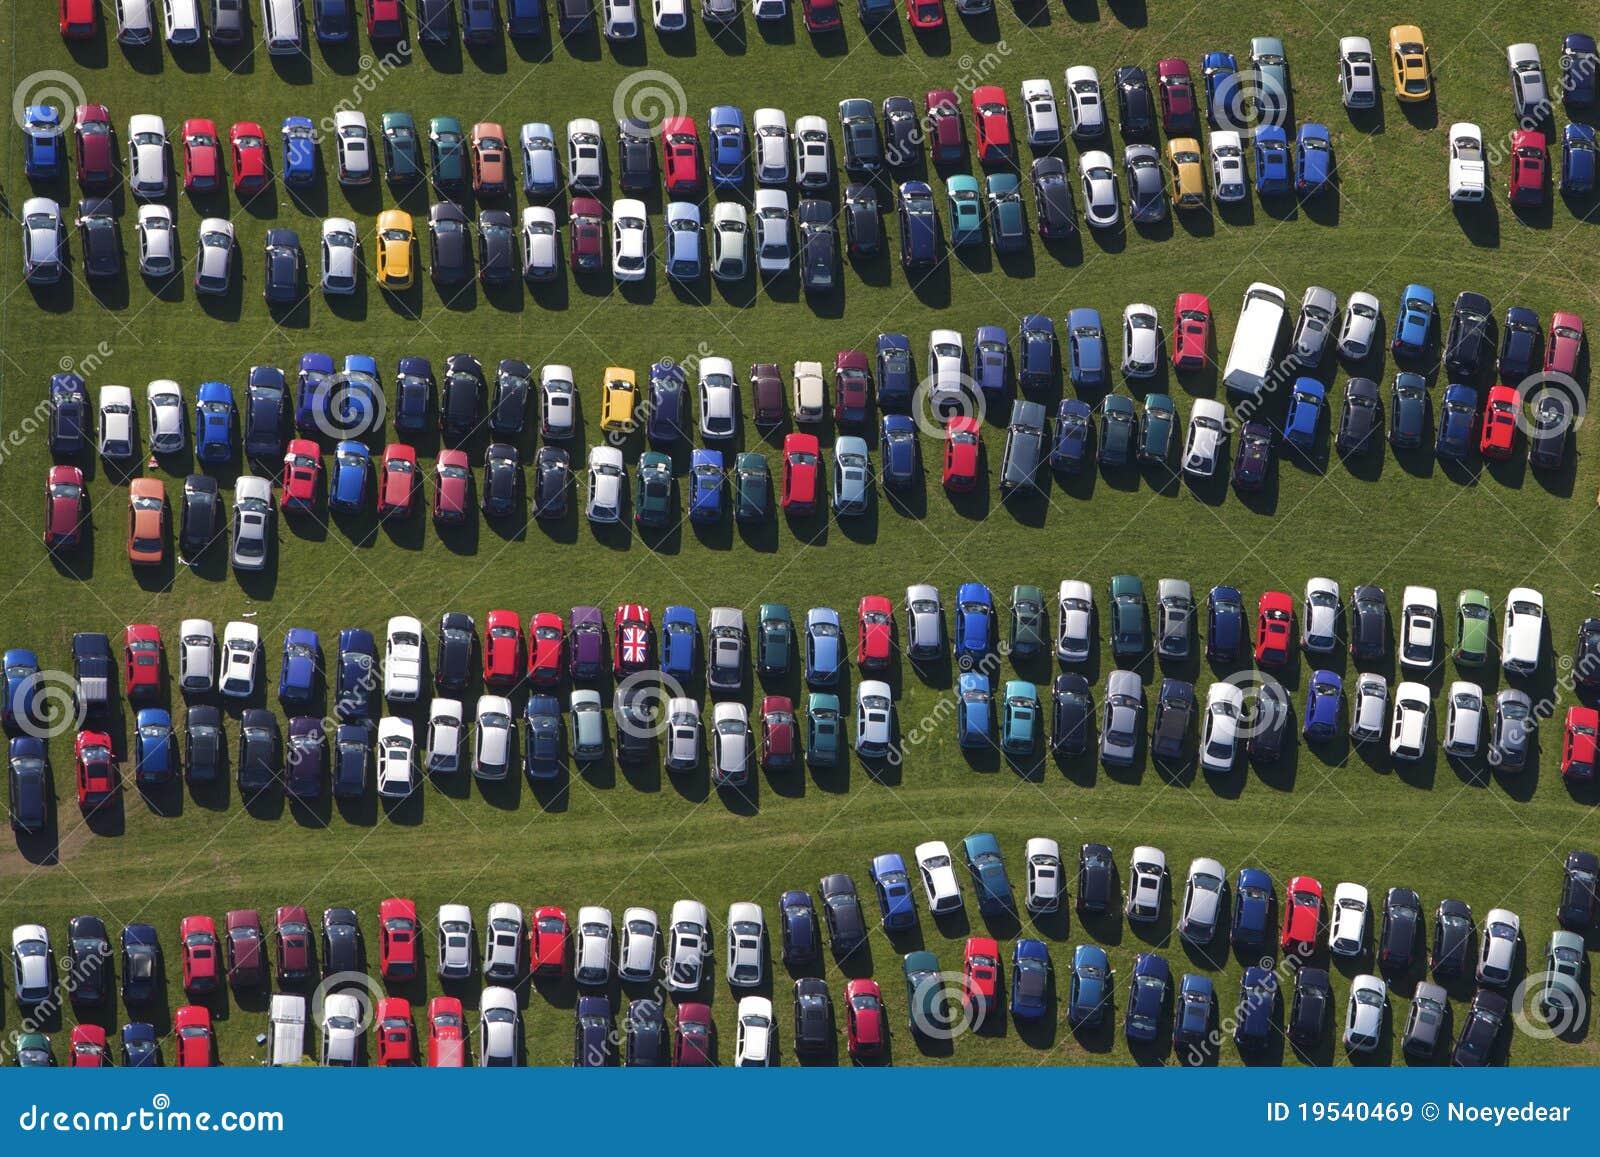 car park rows stock image image of wave colours carpark 19540469. Black Bedroom Furniture Sets. Home Design Ideas